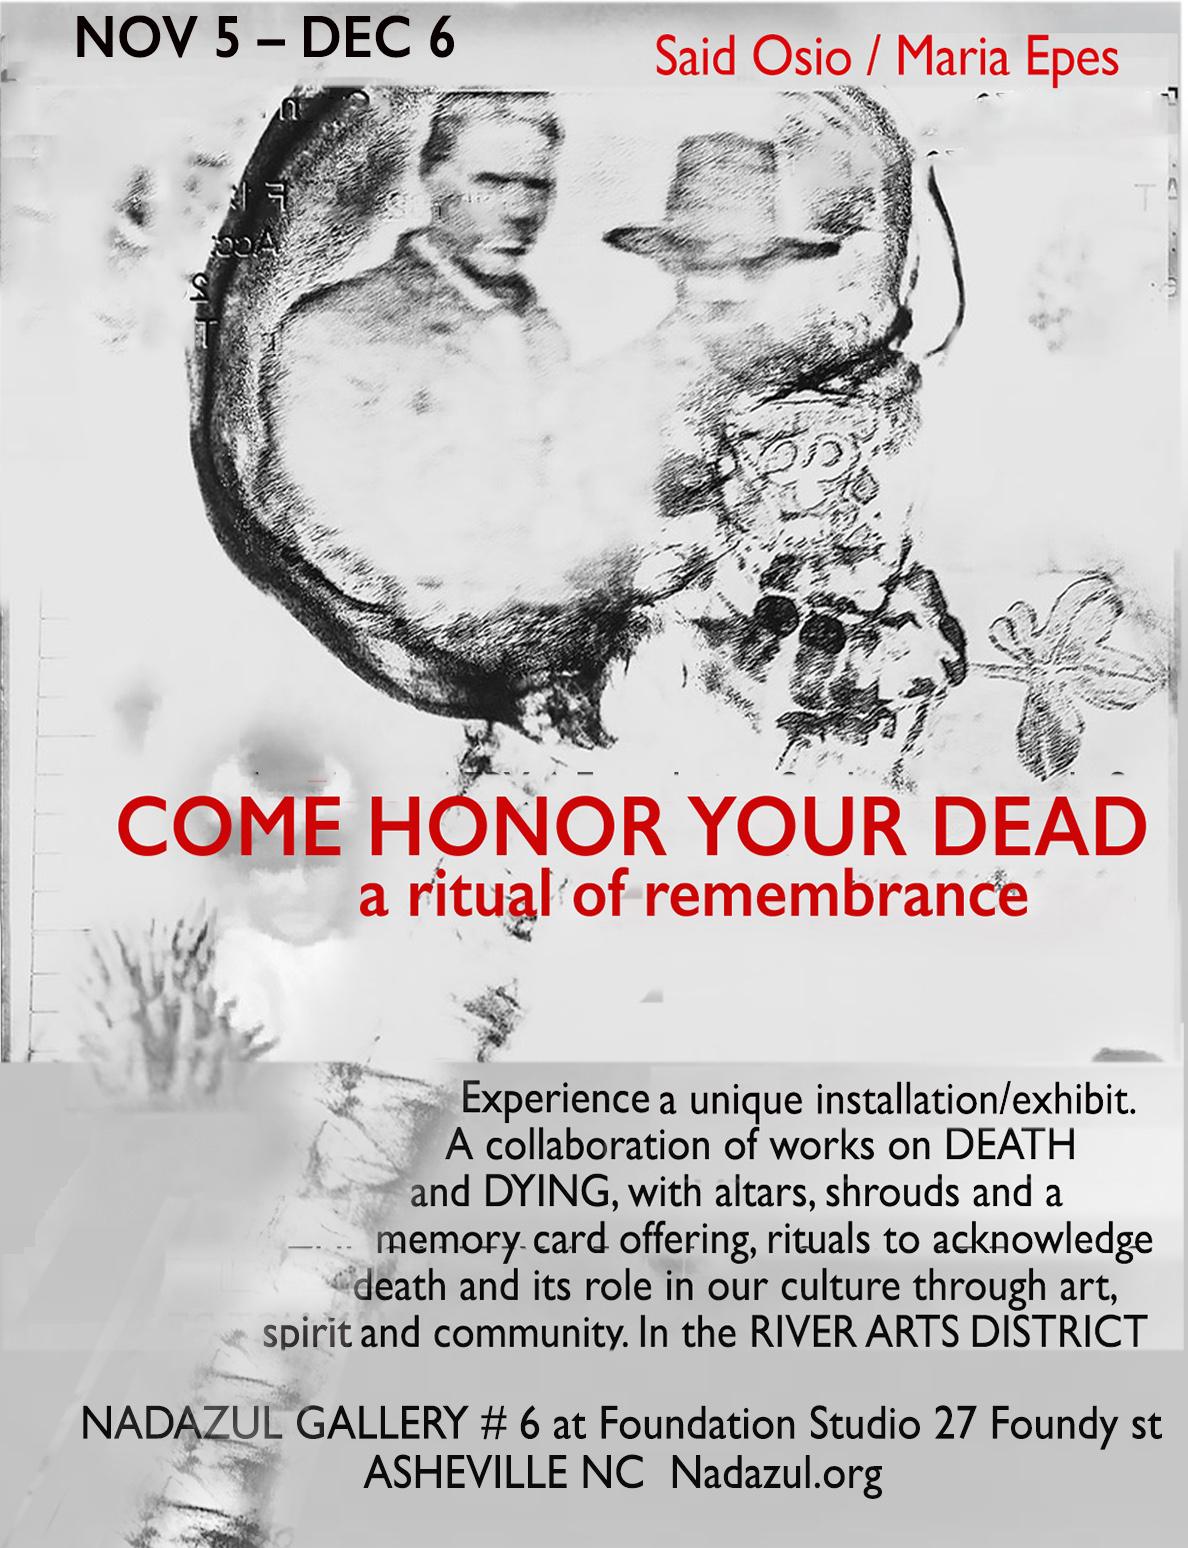 A memorial to loss